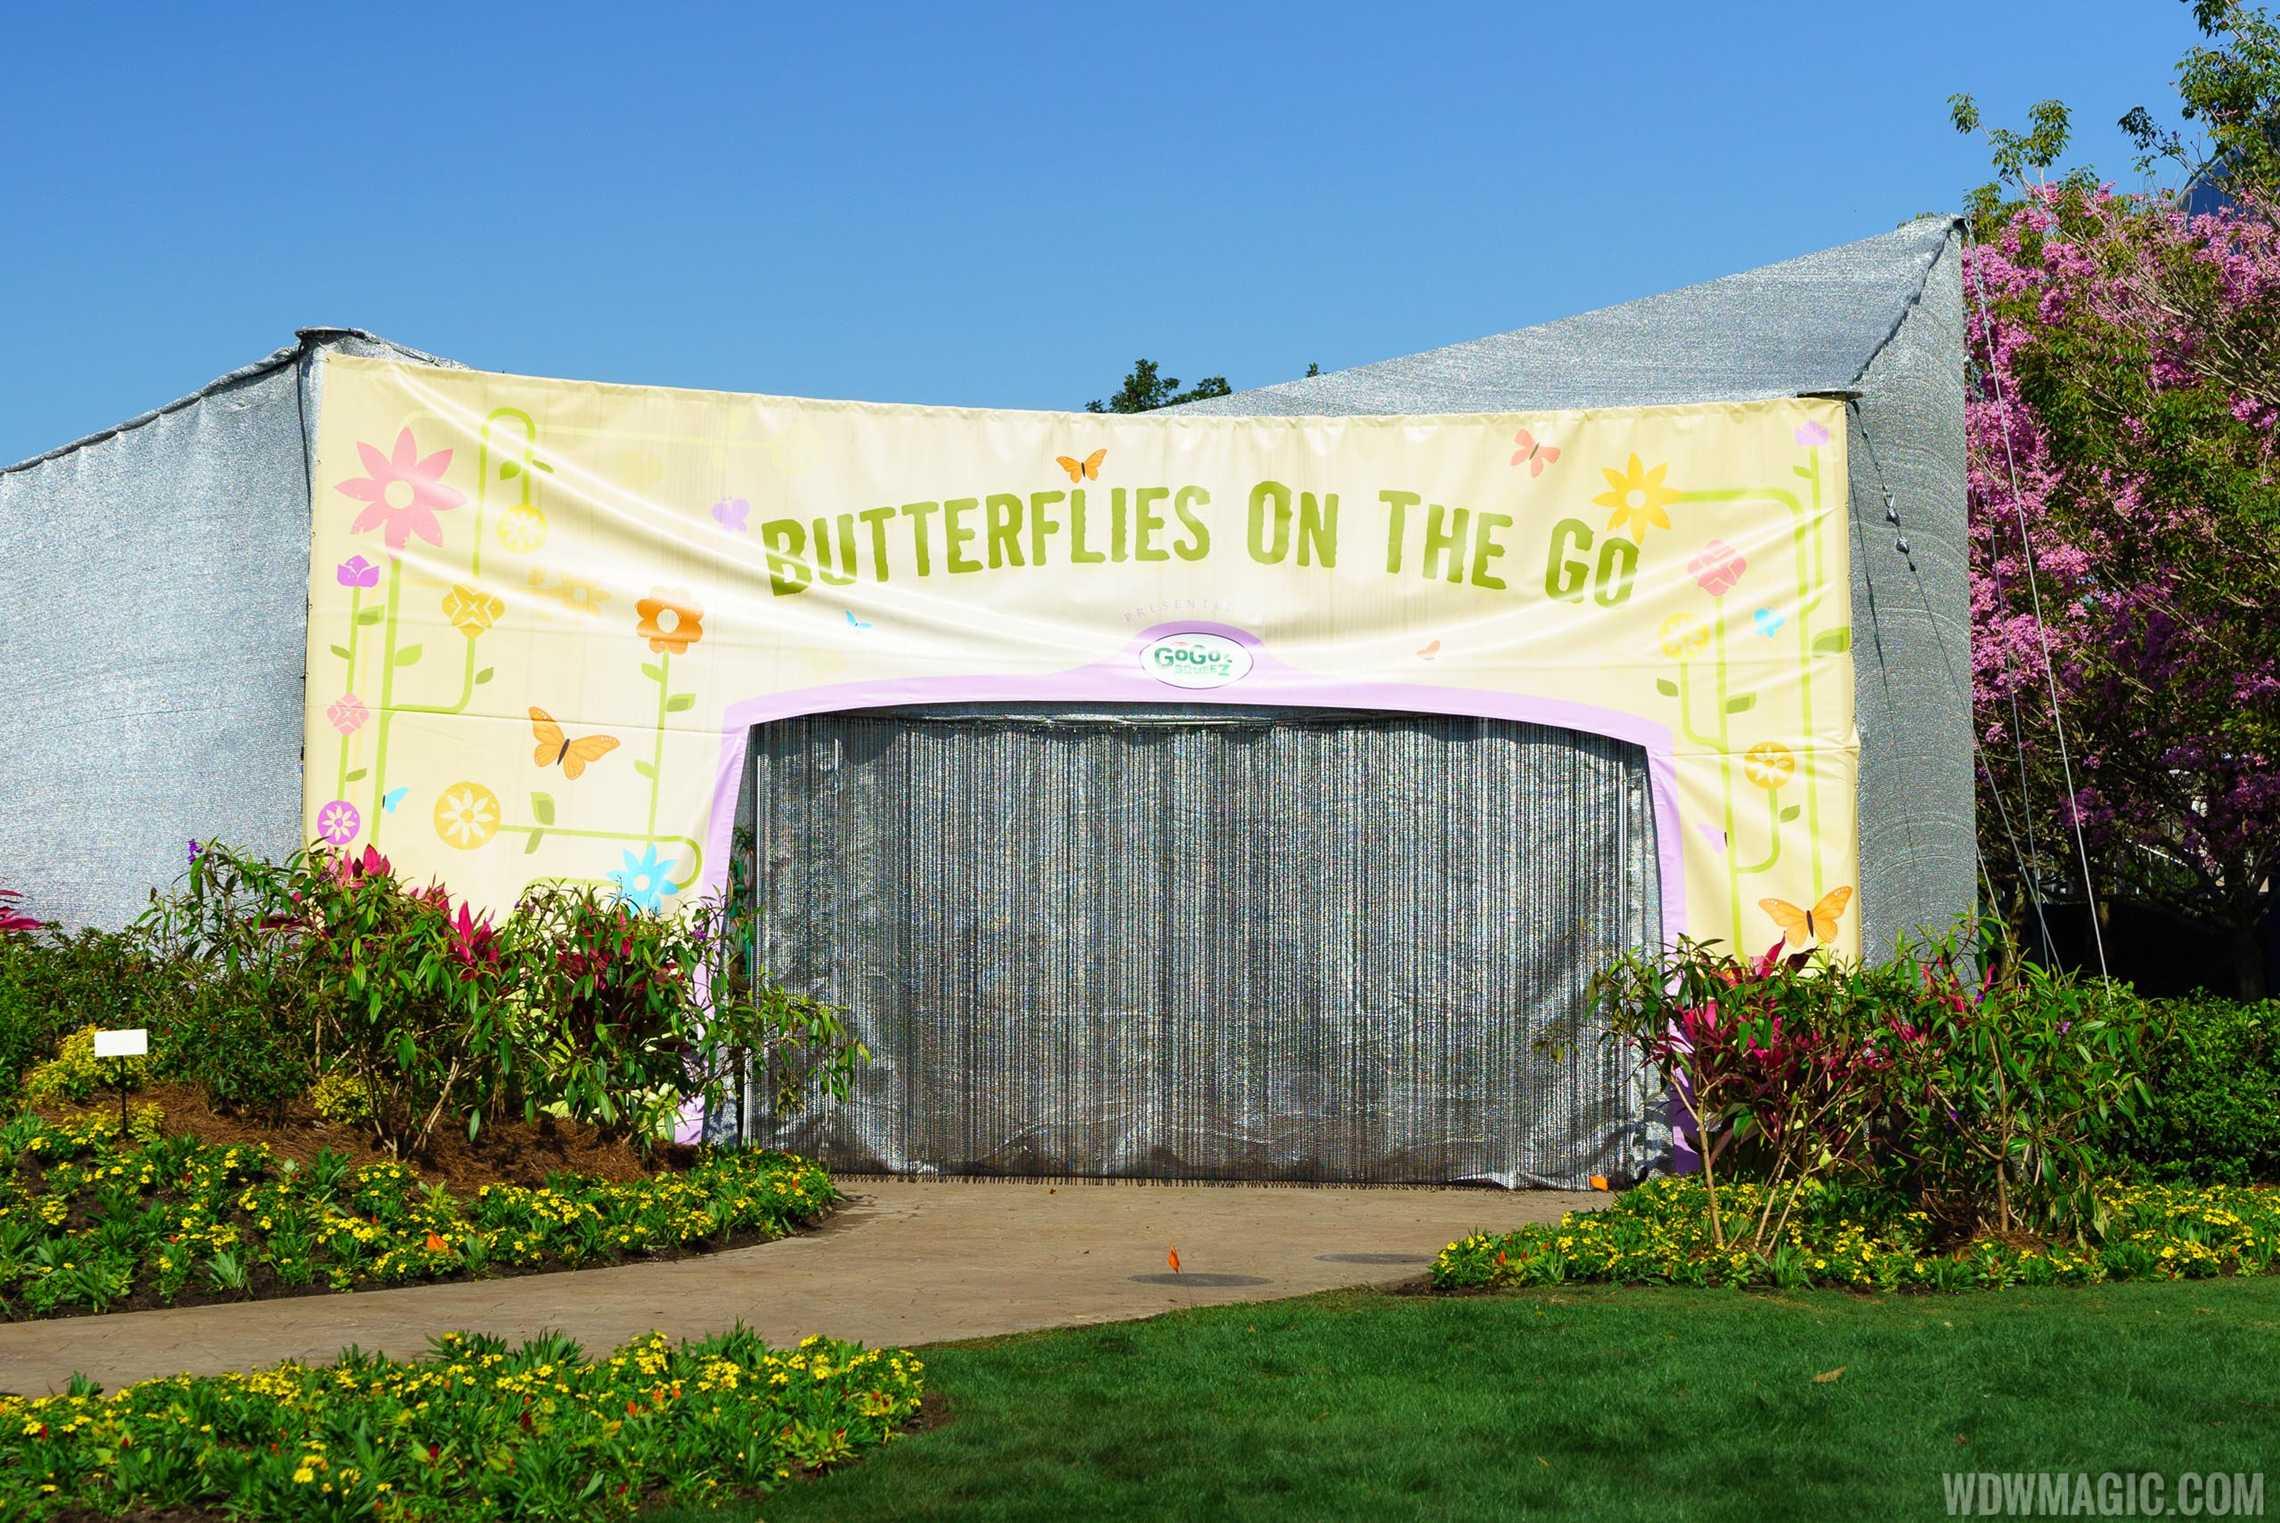 2016 Epcot International Flower and Garden Festival - Butterflies on the Go